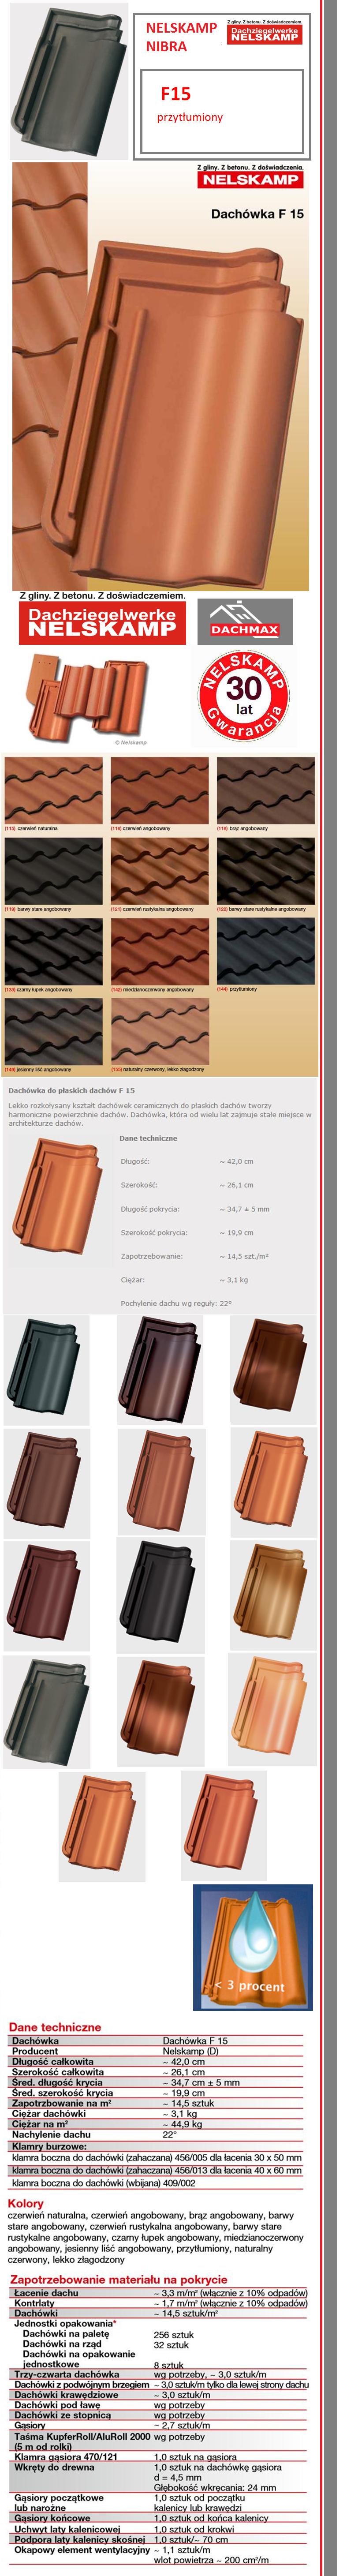 f15 dach wka nelskamp nibra przyt umiony. Black Bedroom Furniture Sets. Home Design Ideas